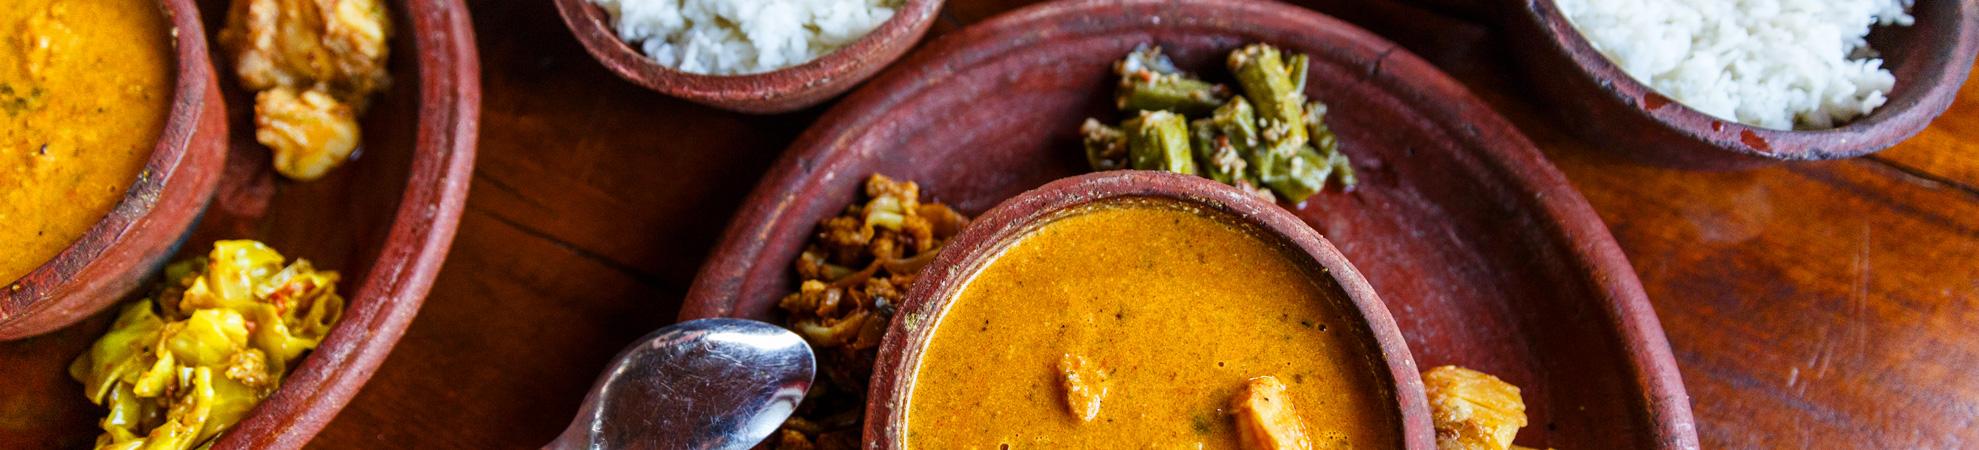 Les spécialités culinaires au Sri Lanka